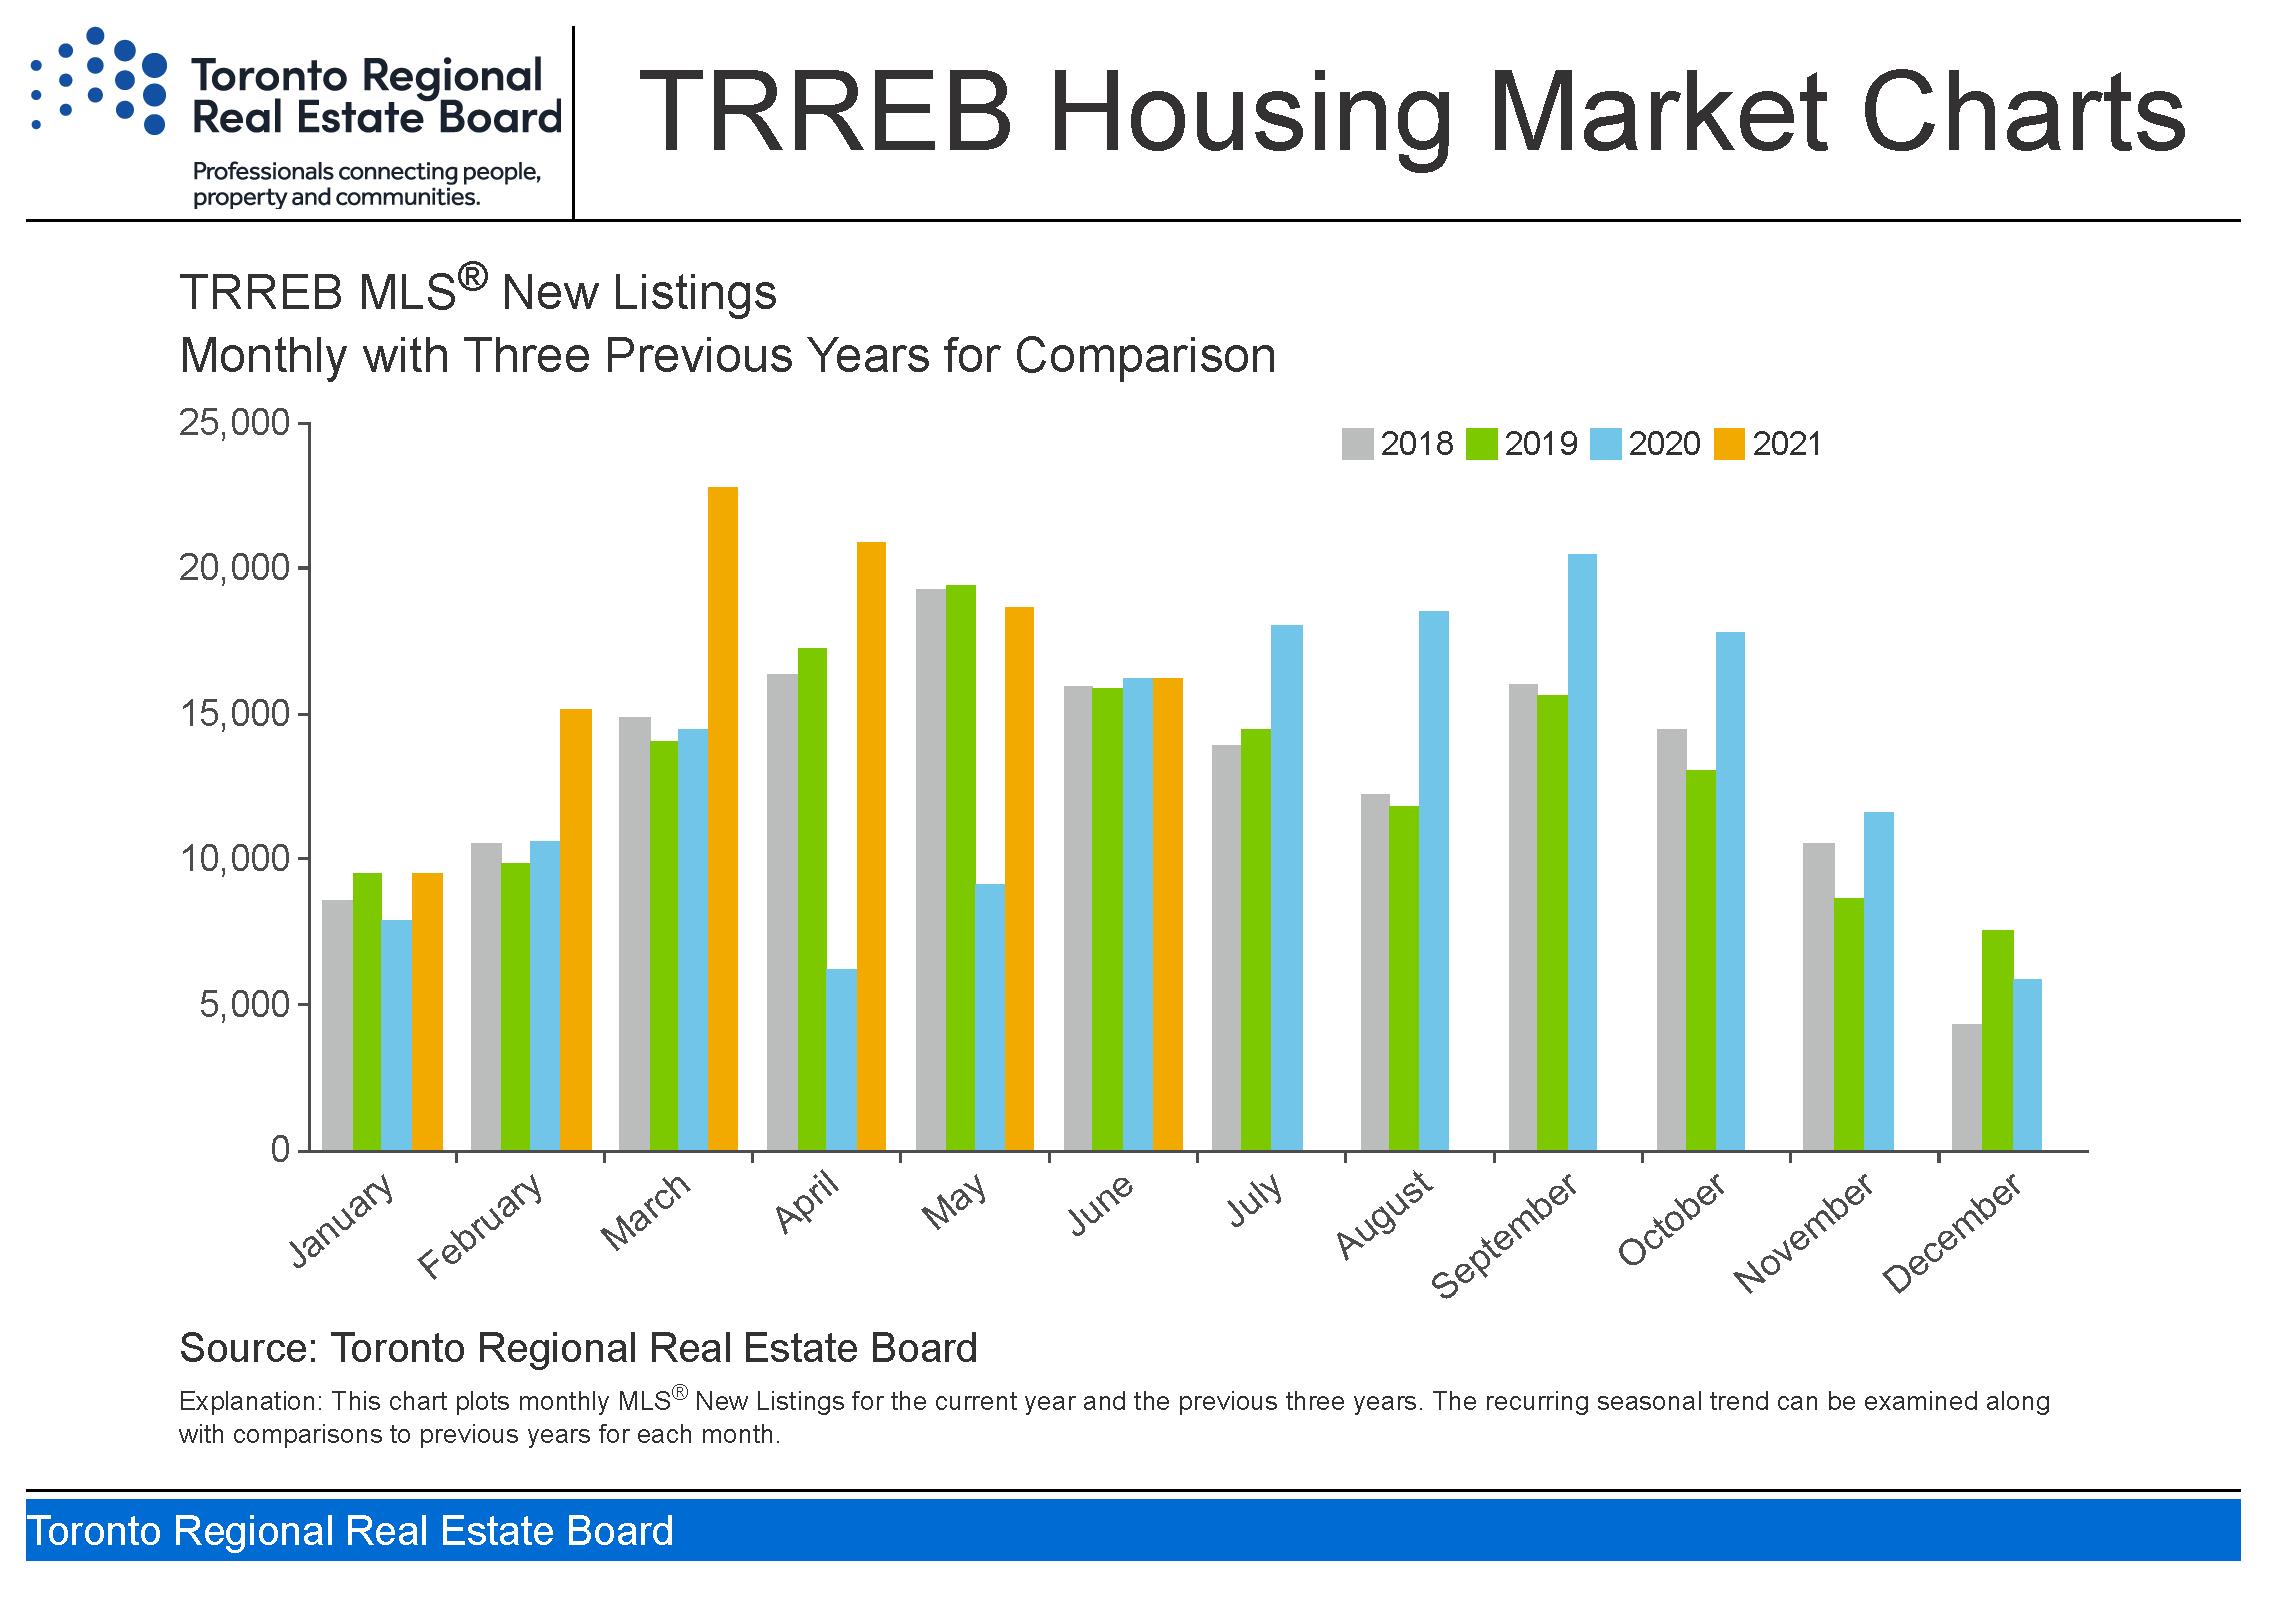 Toronto_housing-charts_TREB_Housing_Market_Charts-June_2021_Page_3